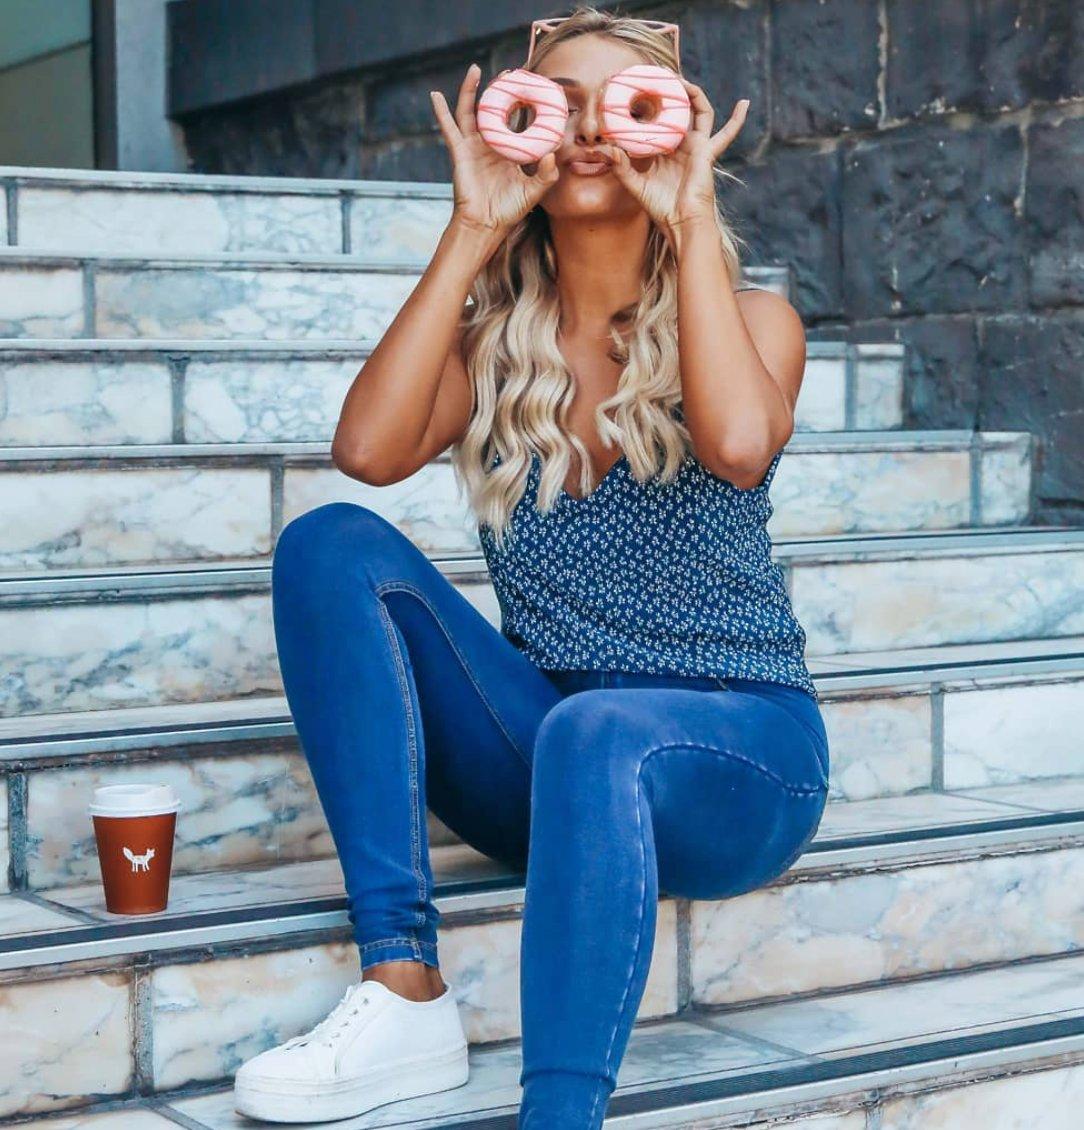 https://t.co/GTIeayqNt6 . #homewithfreddy #freddy #winterfashion #bootyshaping #charlidamelio #addisonrae #tiktok #style #fashion #leatherpants #denim #highwaisted #jeans #lockdown #quaratine  #sale #blackfriday https://t.co/AaLEb0nmti